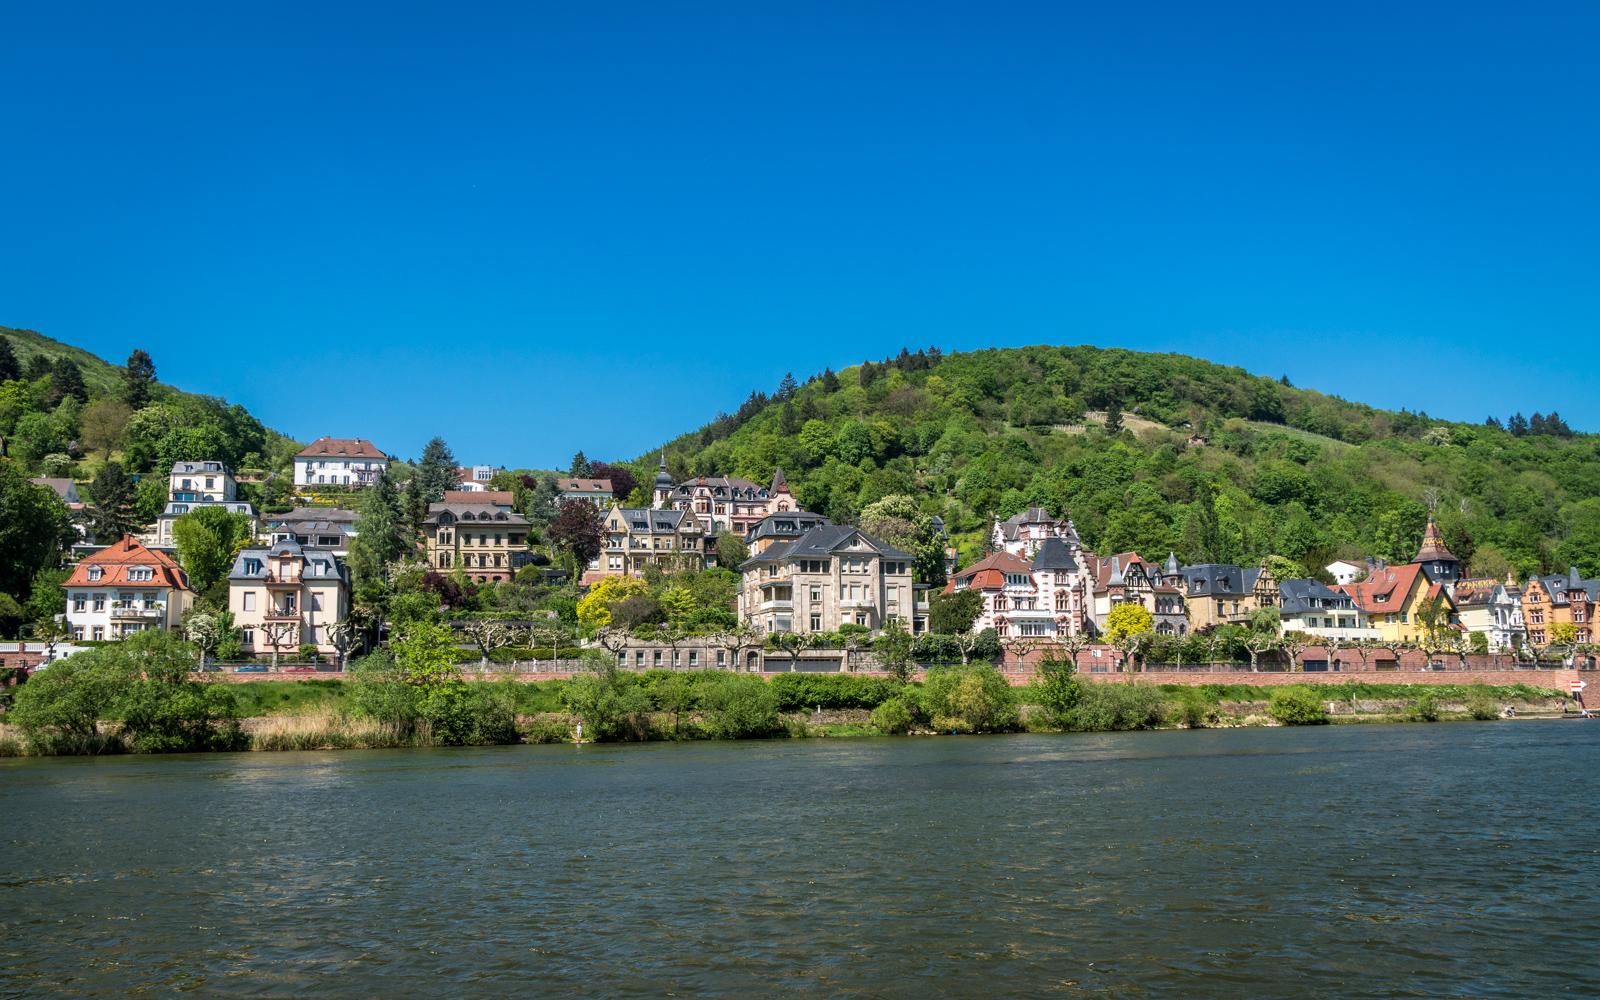 Heidelberger Neckarufer